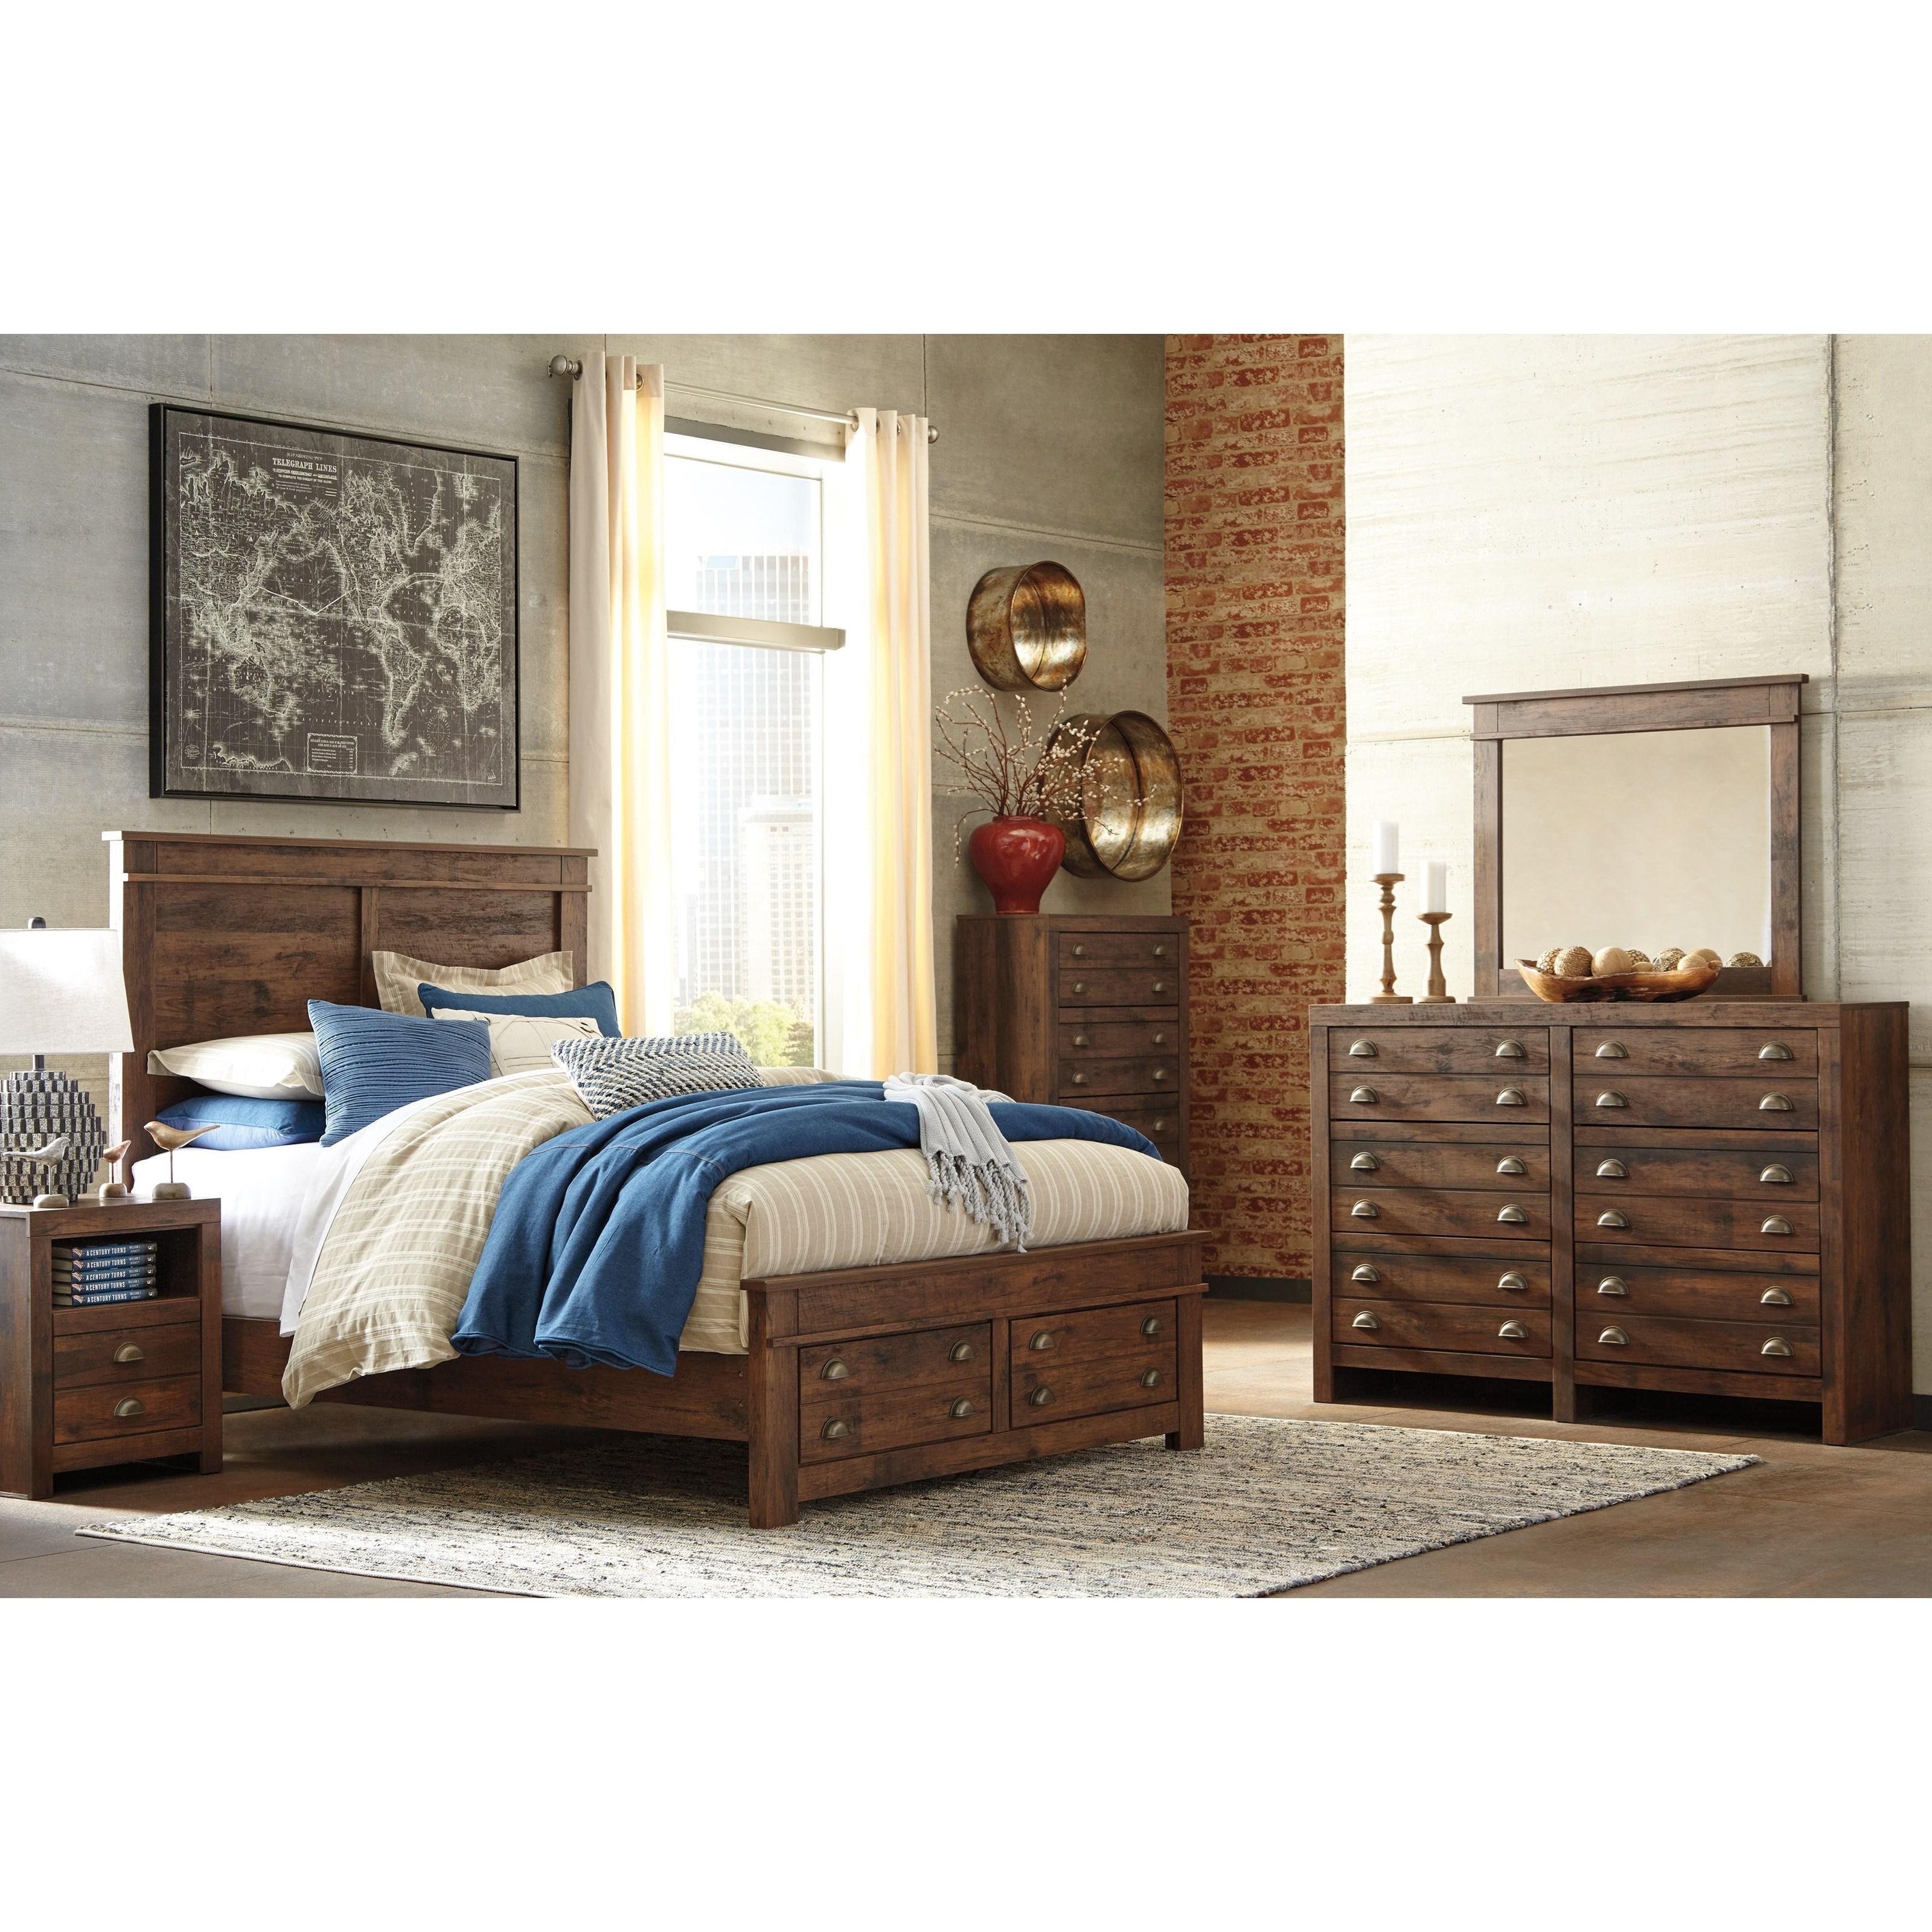 Signature Design by Ashley Hammerstead Queen Bedroom Group Olinde s Fur